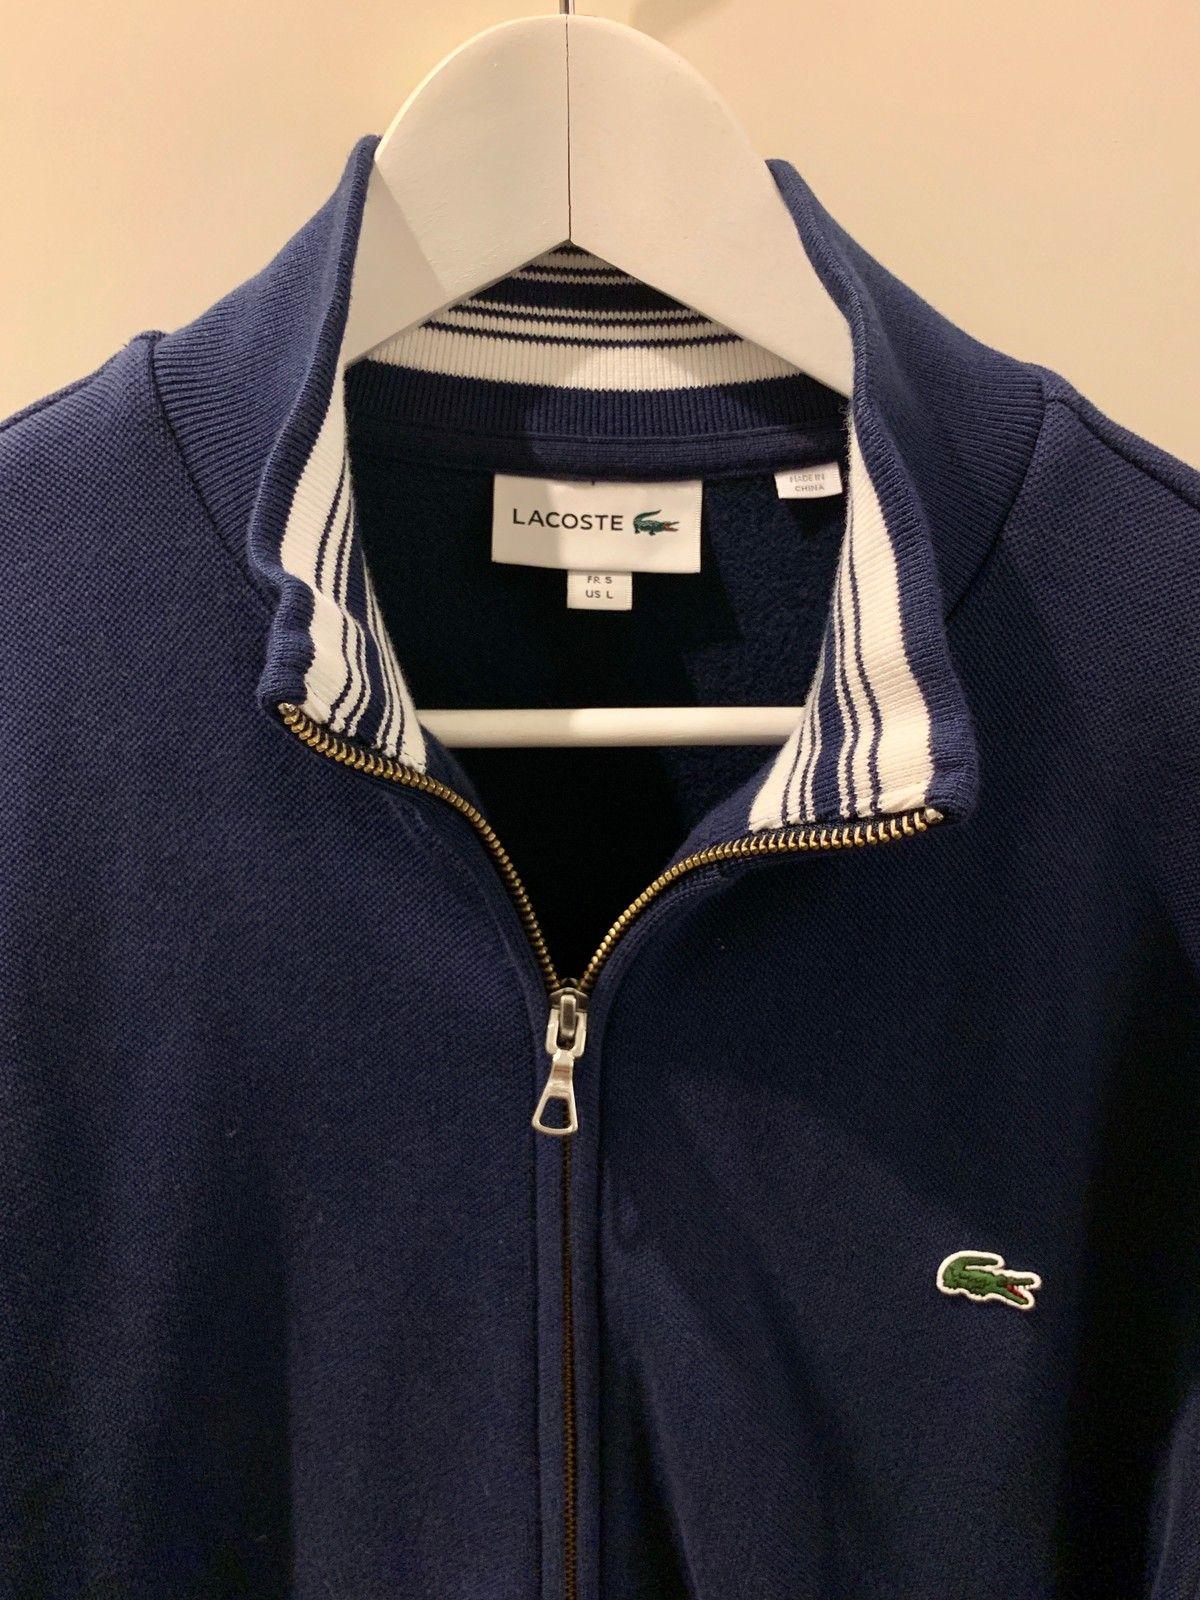 064ef8afe05 Lacoste jakke-genser selges, som ny.   FINN.no